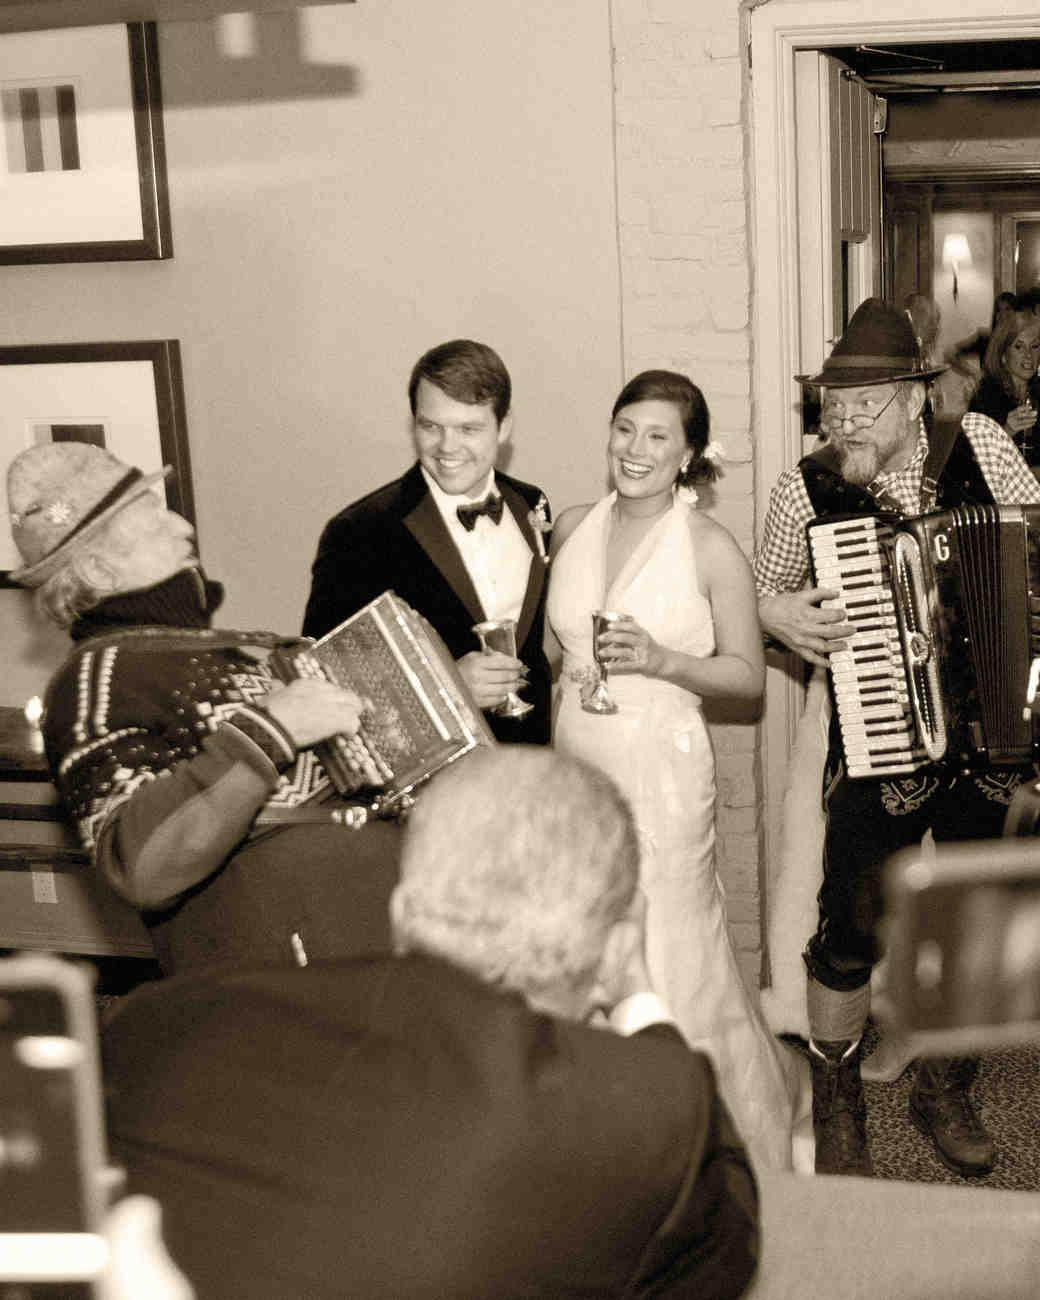 accordions-mwds109266.jpg